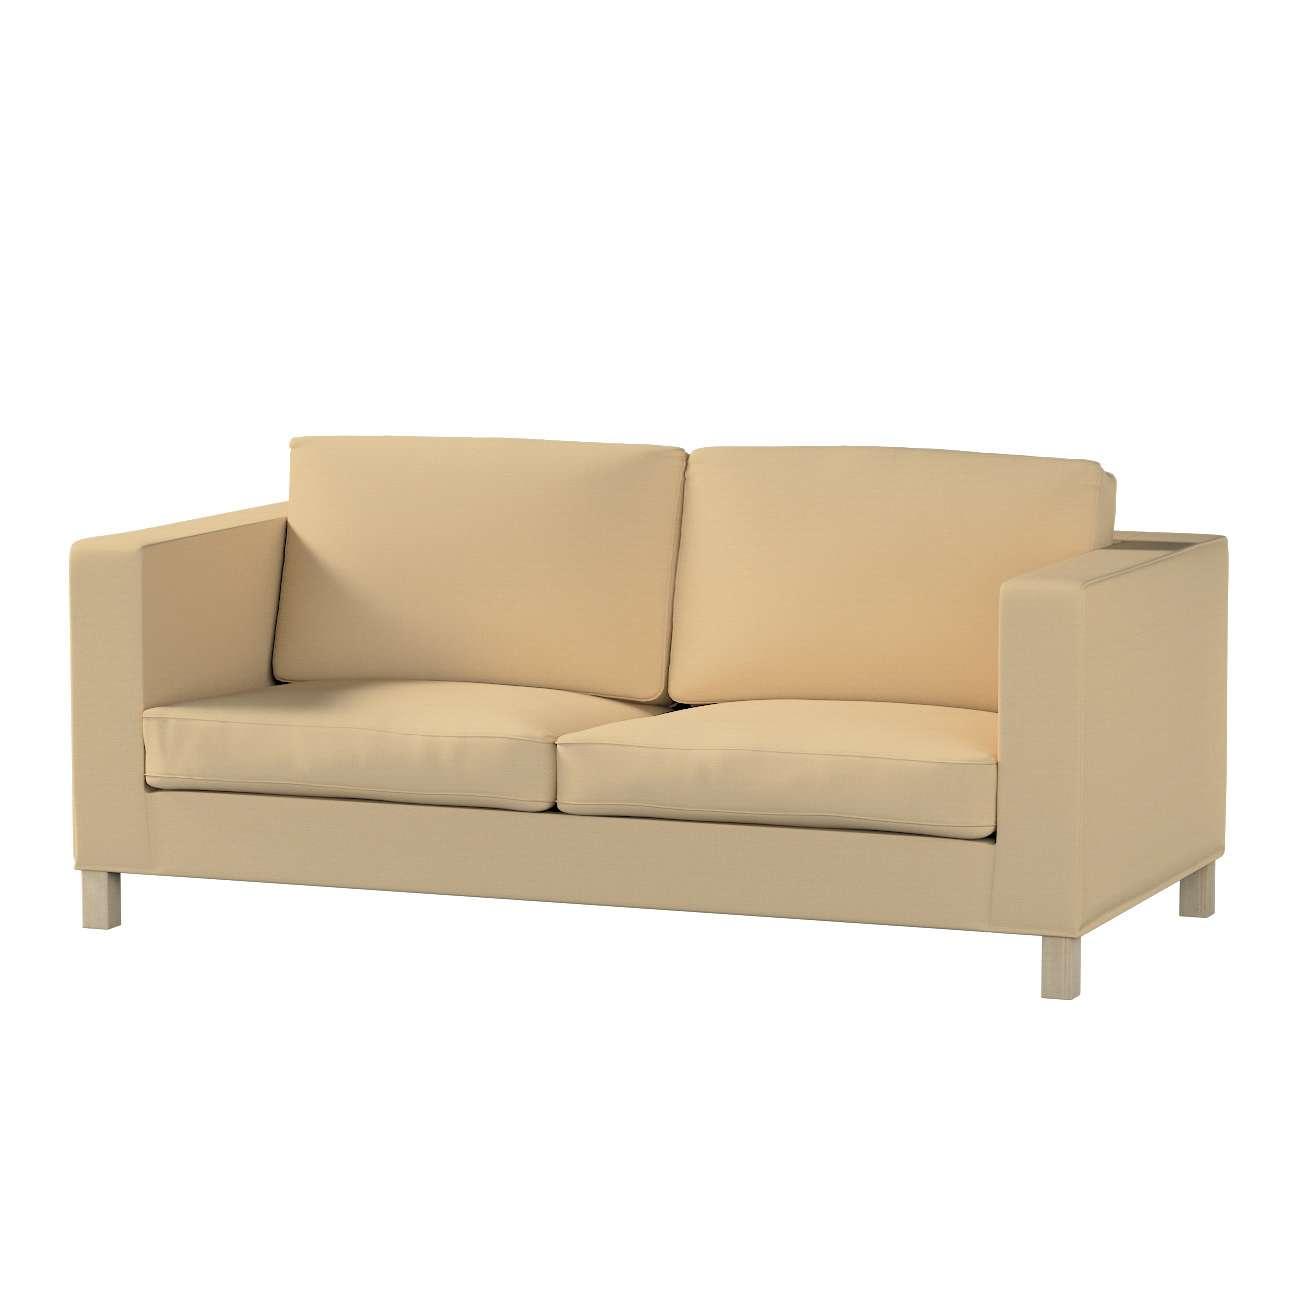 Potah na pohovku IKEA  Karlanda rozkládací, krátký pohovka Karlanda rozkládací v kolekci Cotton Panama, látka: 702-01